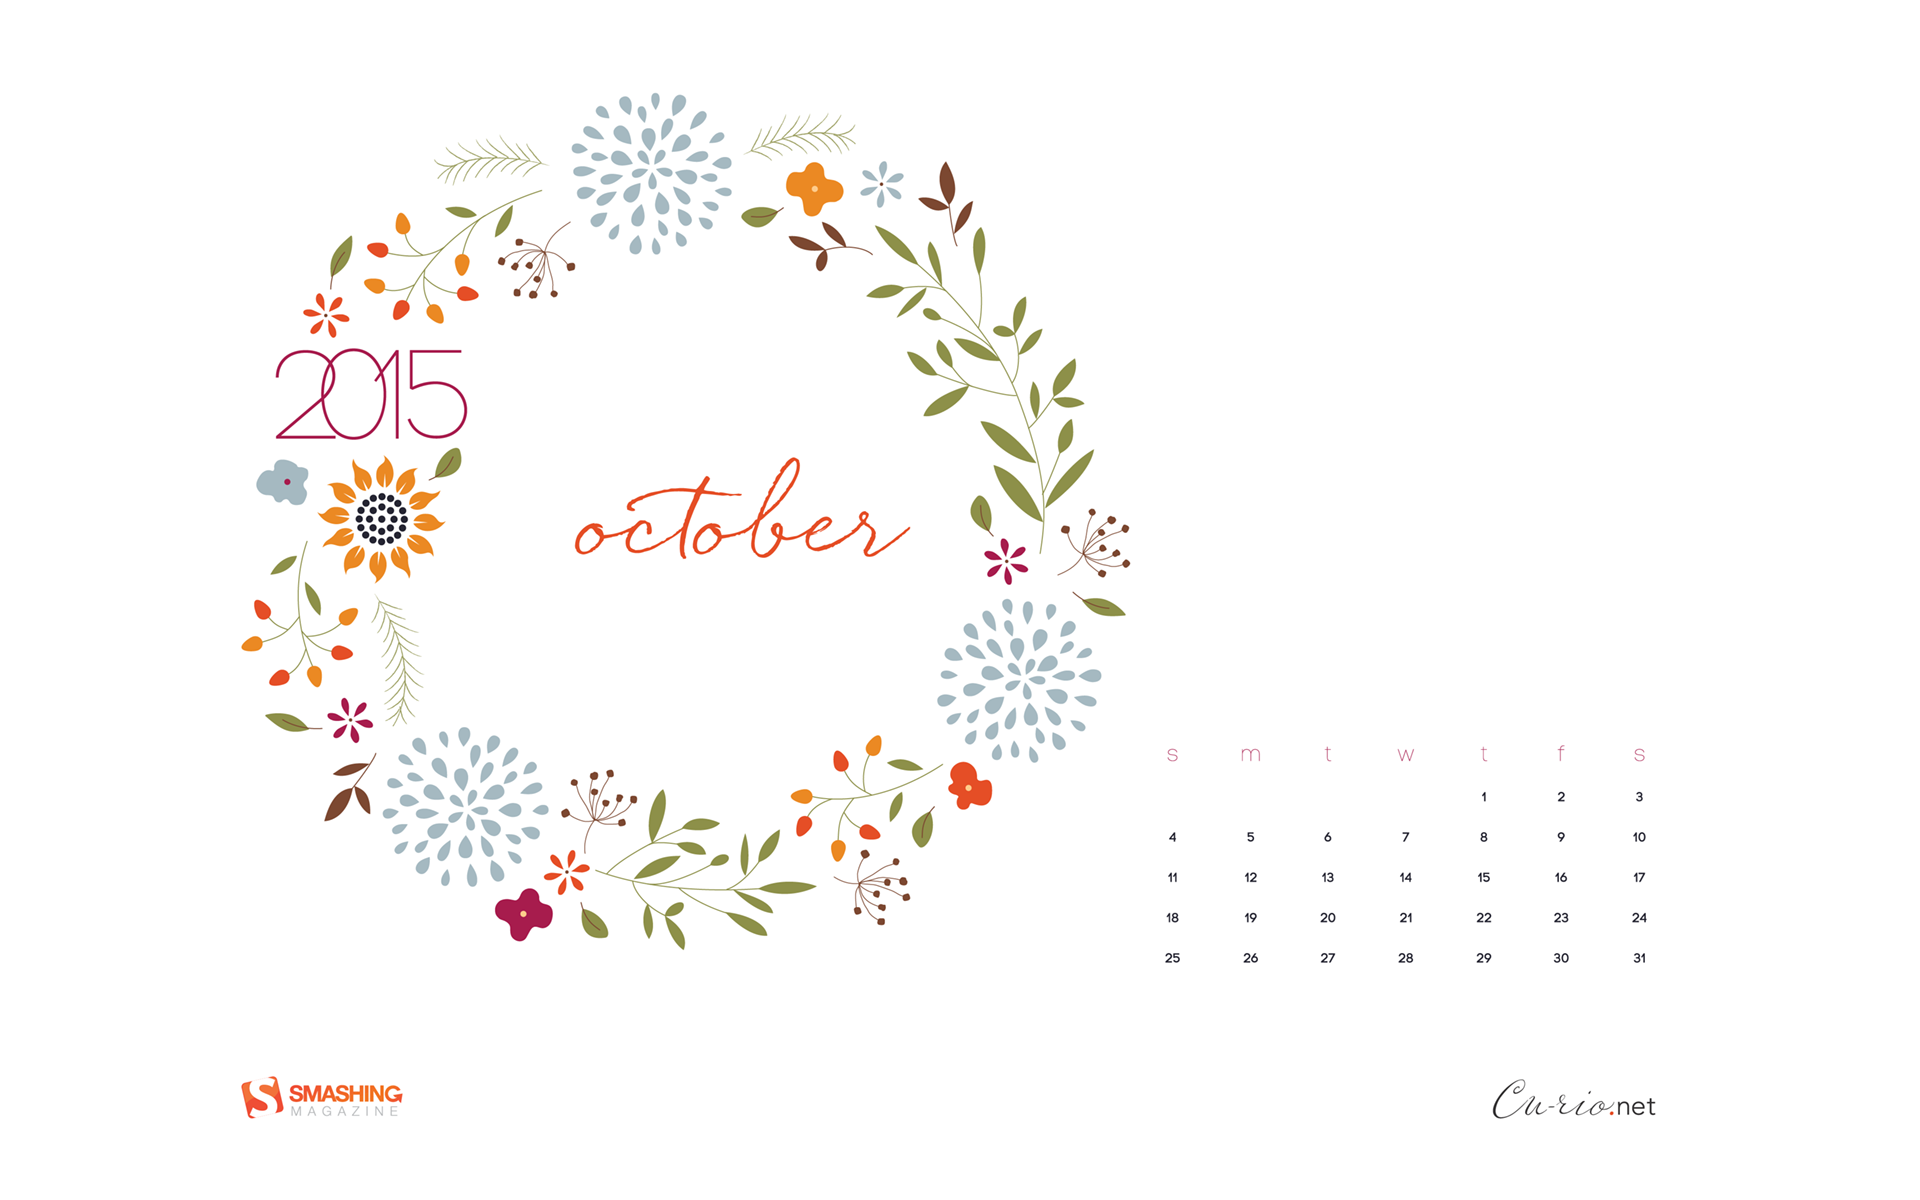 Desktop Wallpaper Calendars: October